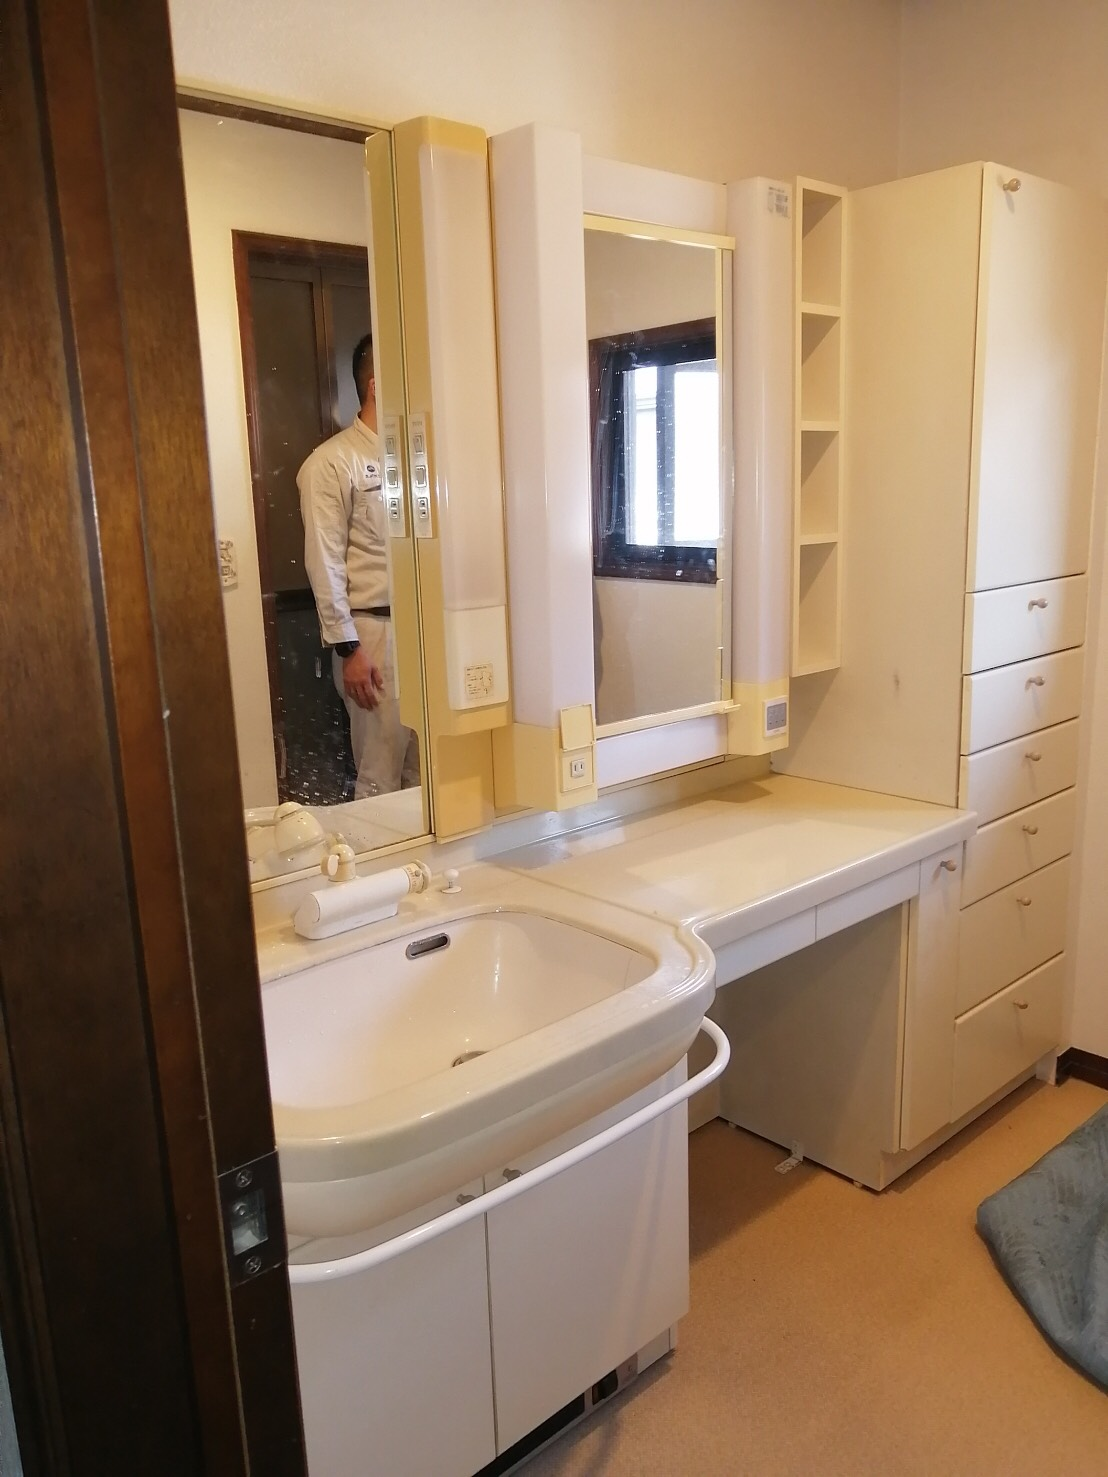 N様邸 すっきりと落ち着いた洗面台をご提案!